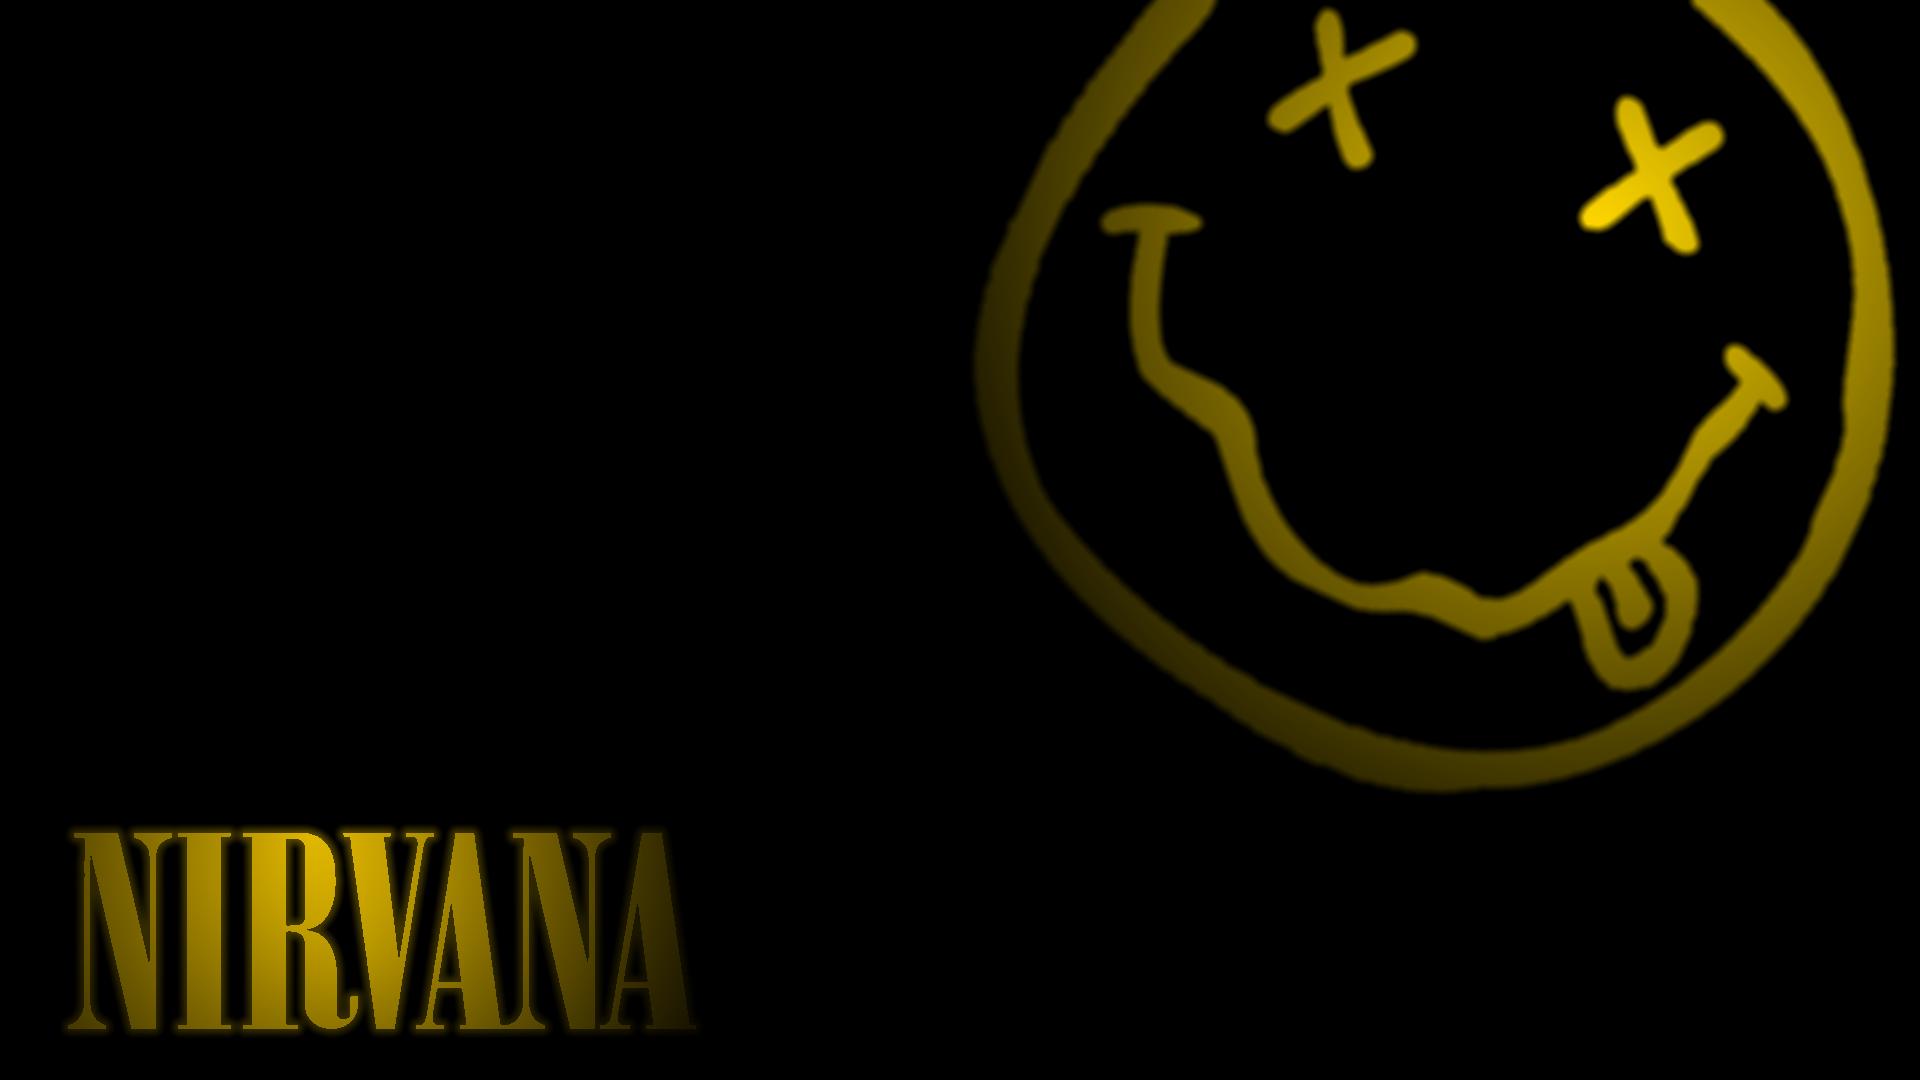 nirvana wallpapers wallpaper cave kurt cobain nirvana and rh pinterest com Grenade Inc Grenade Icon